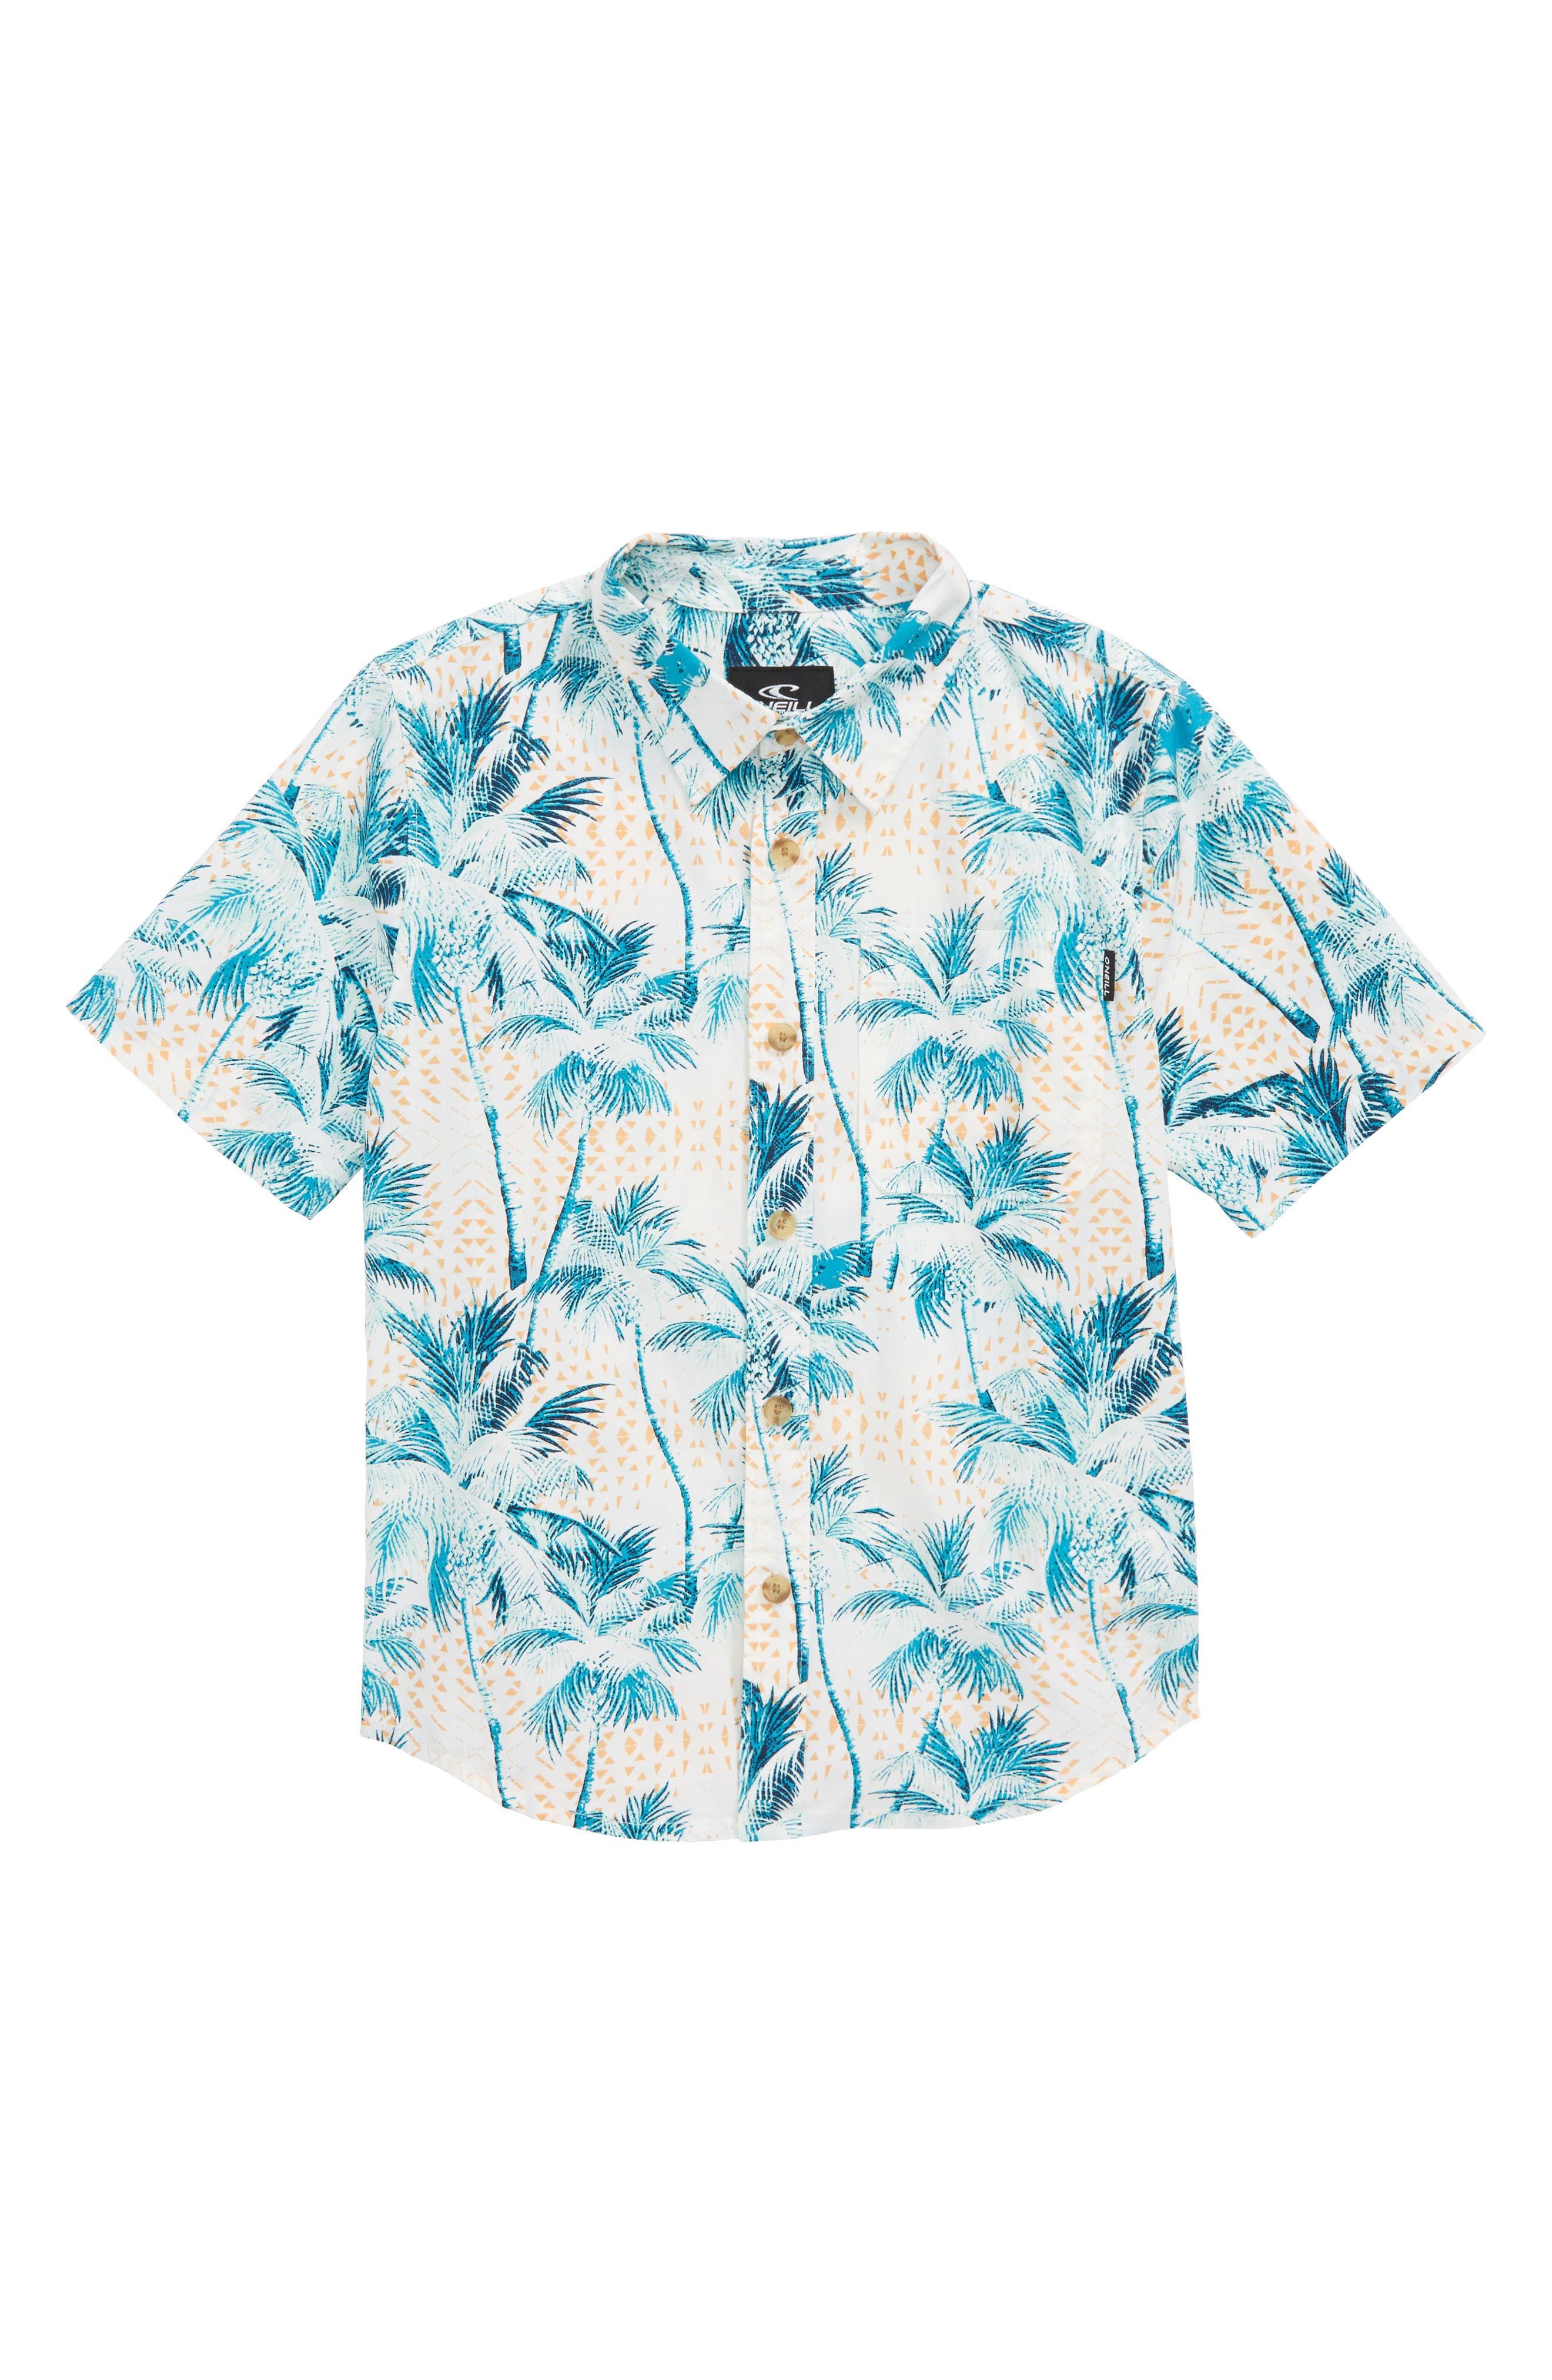 O'Neill Geronimo Palm Tree Woven Shirt (Toddler Boys)